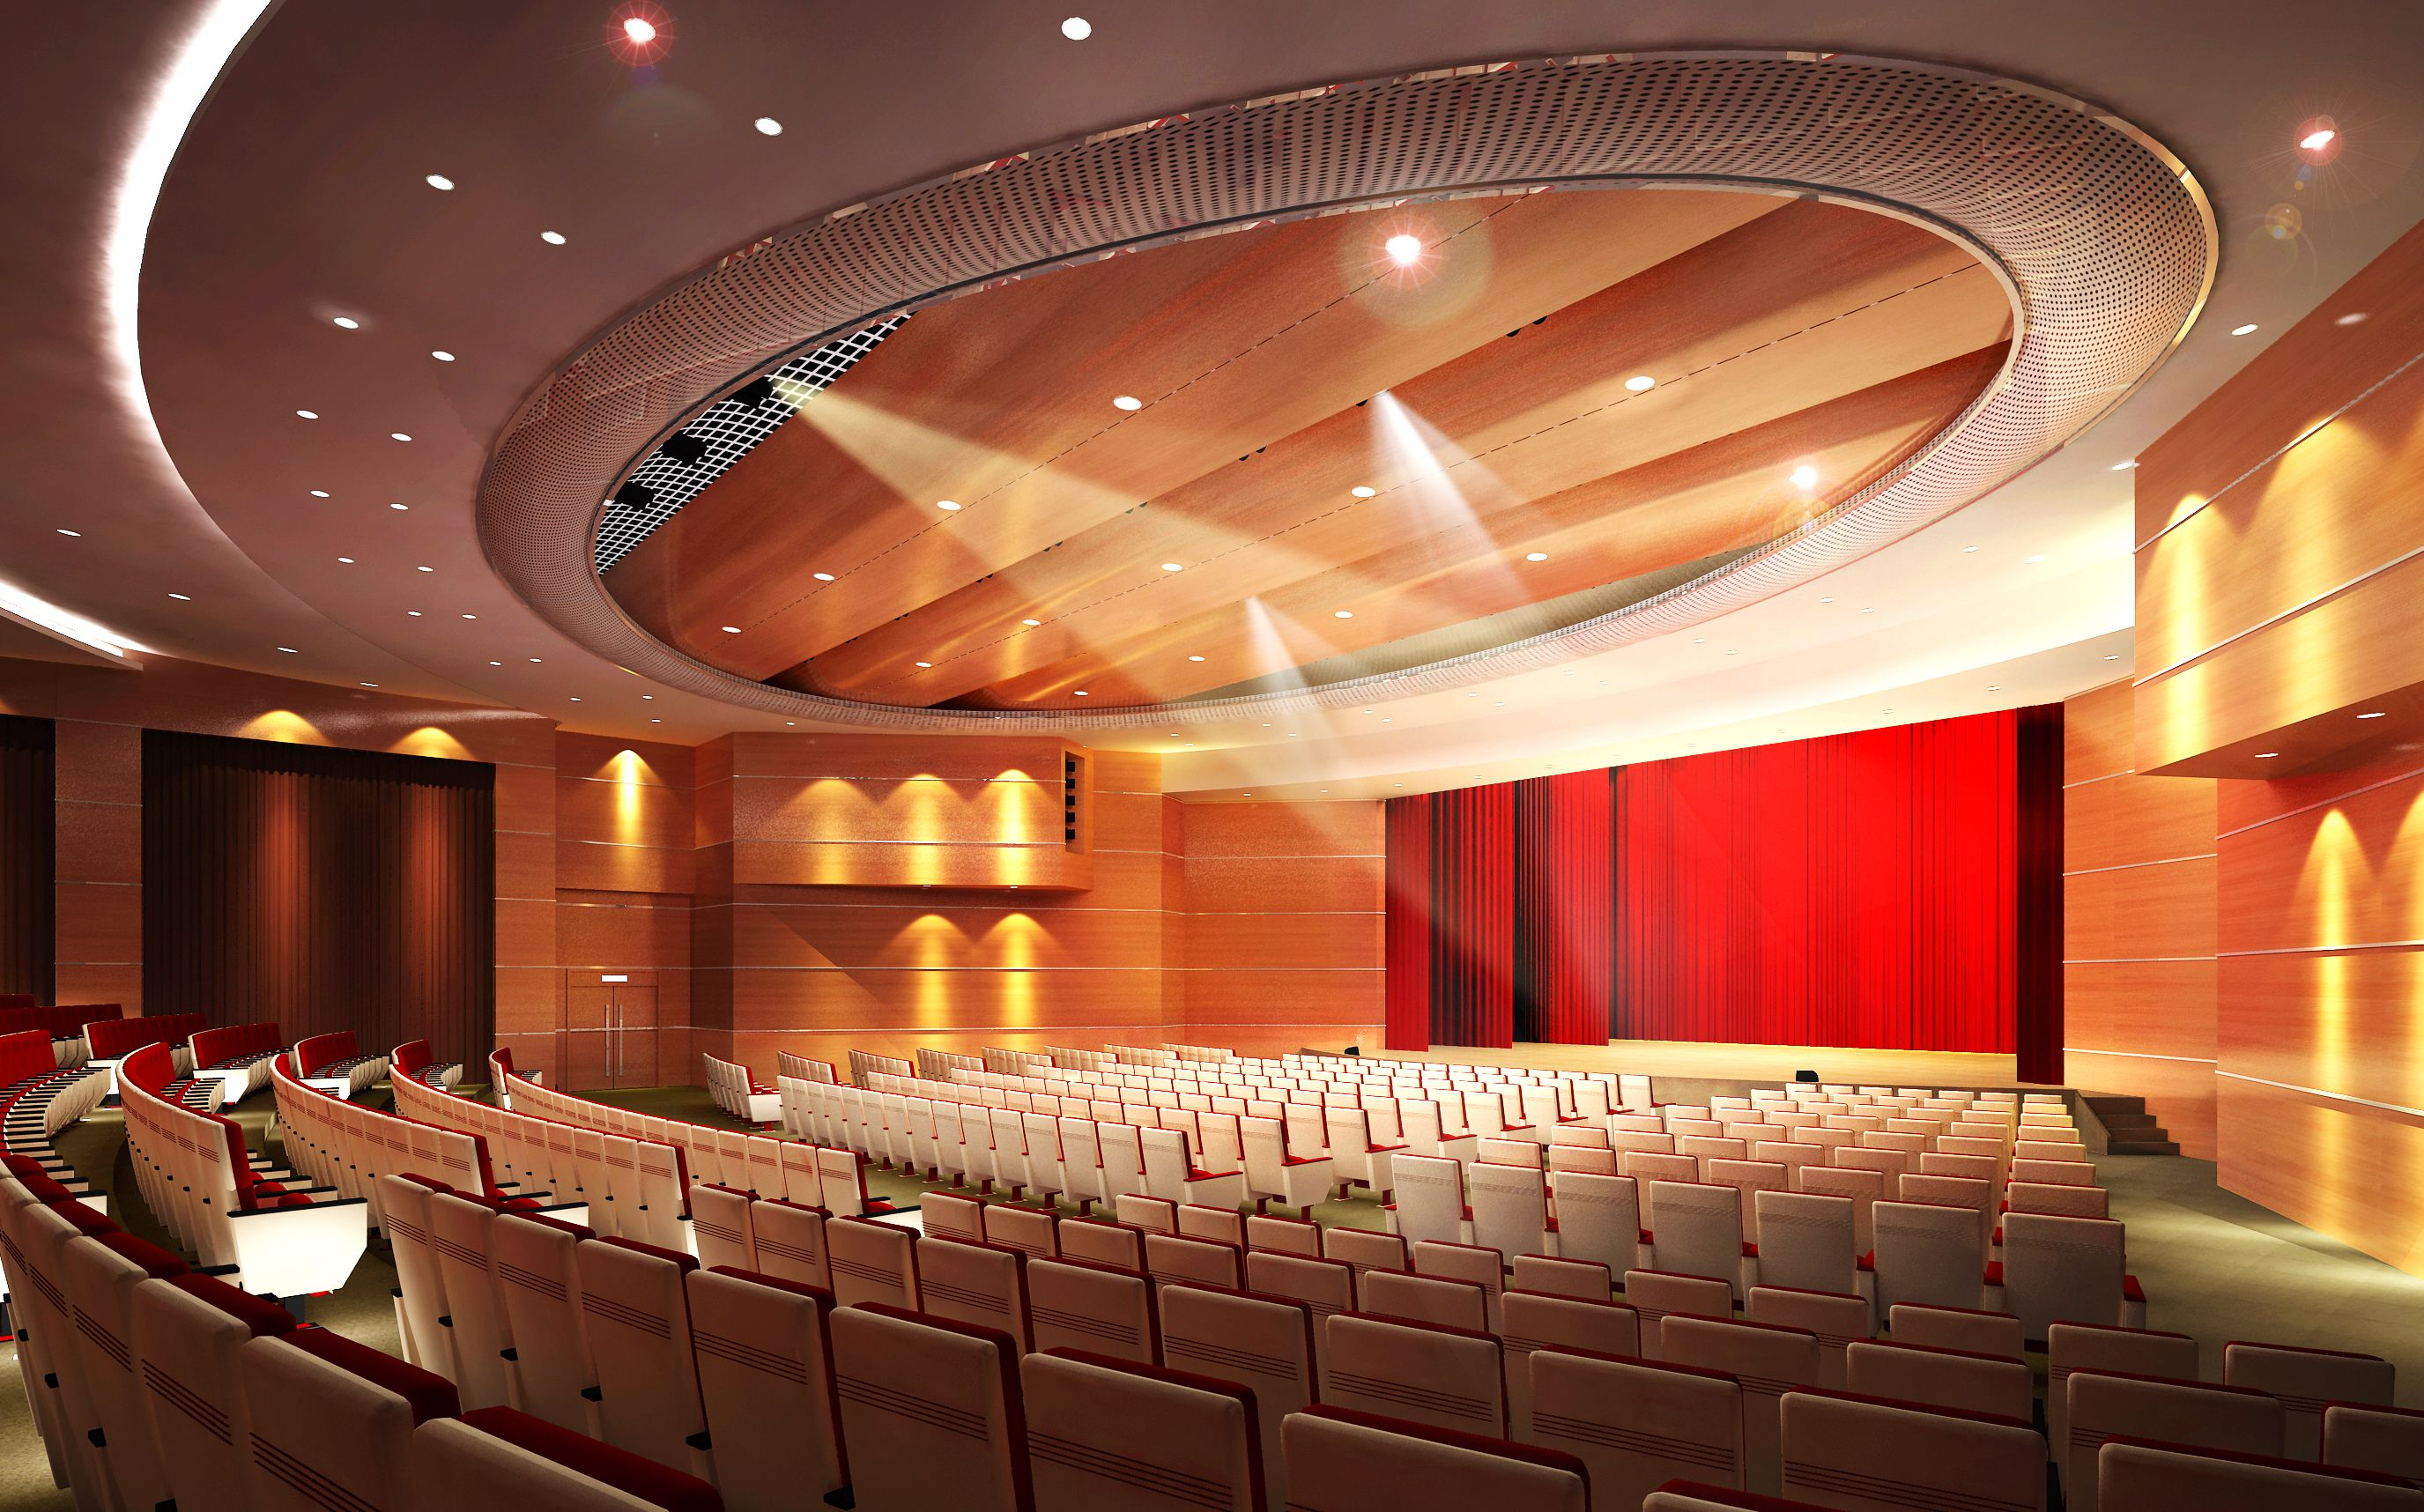 Auditorium Room008 3D Model- * Highly detailed Hi-Tech